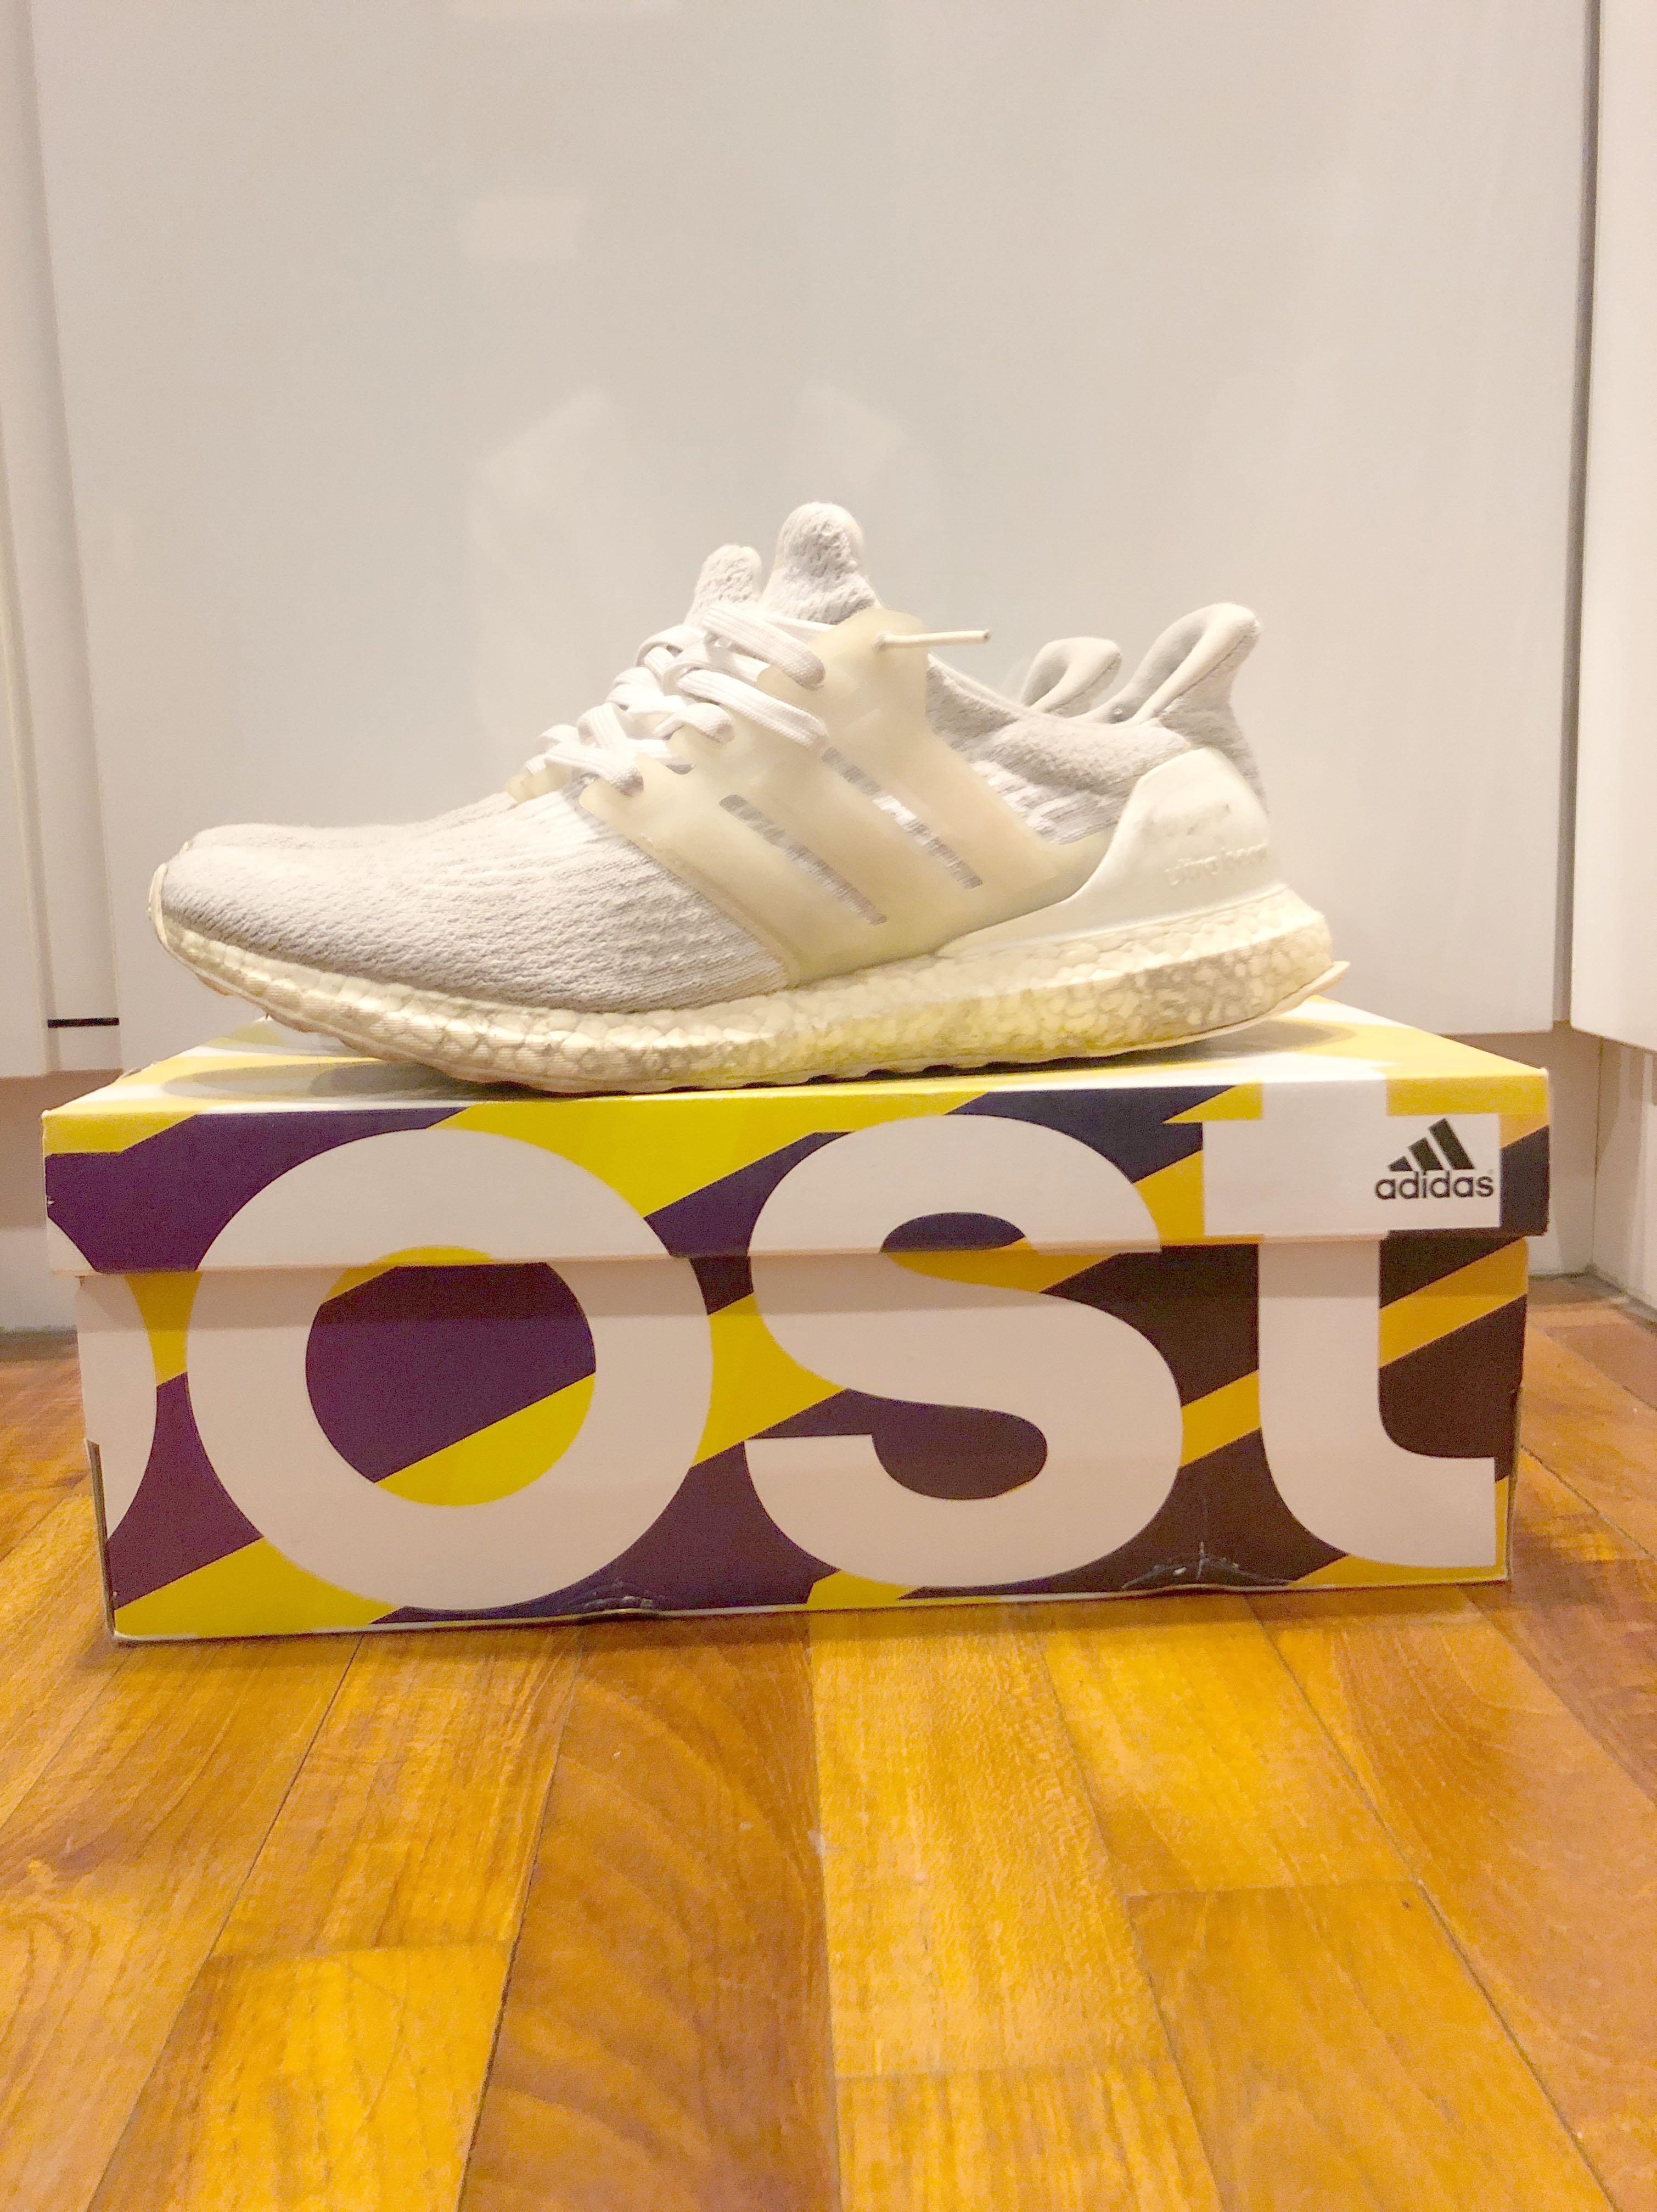 3fa448dc8 Adidas triple white ultraboost 3.0